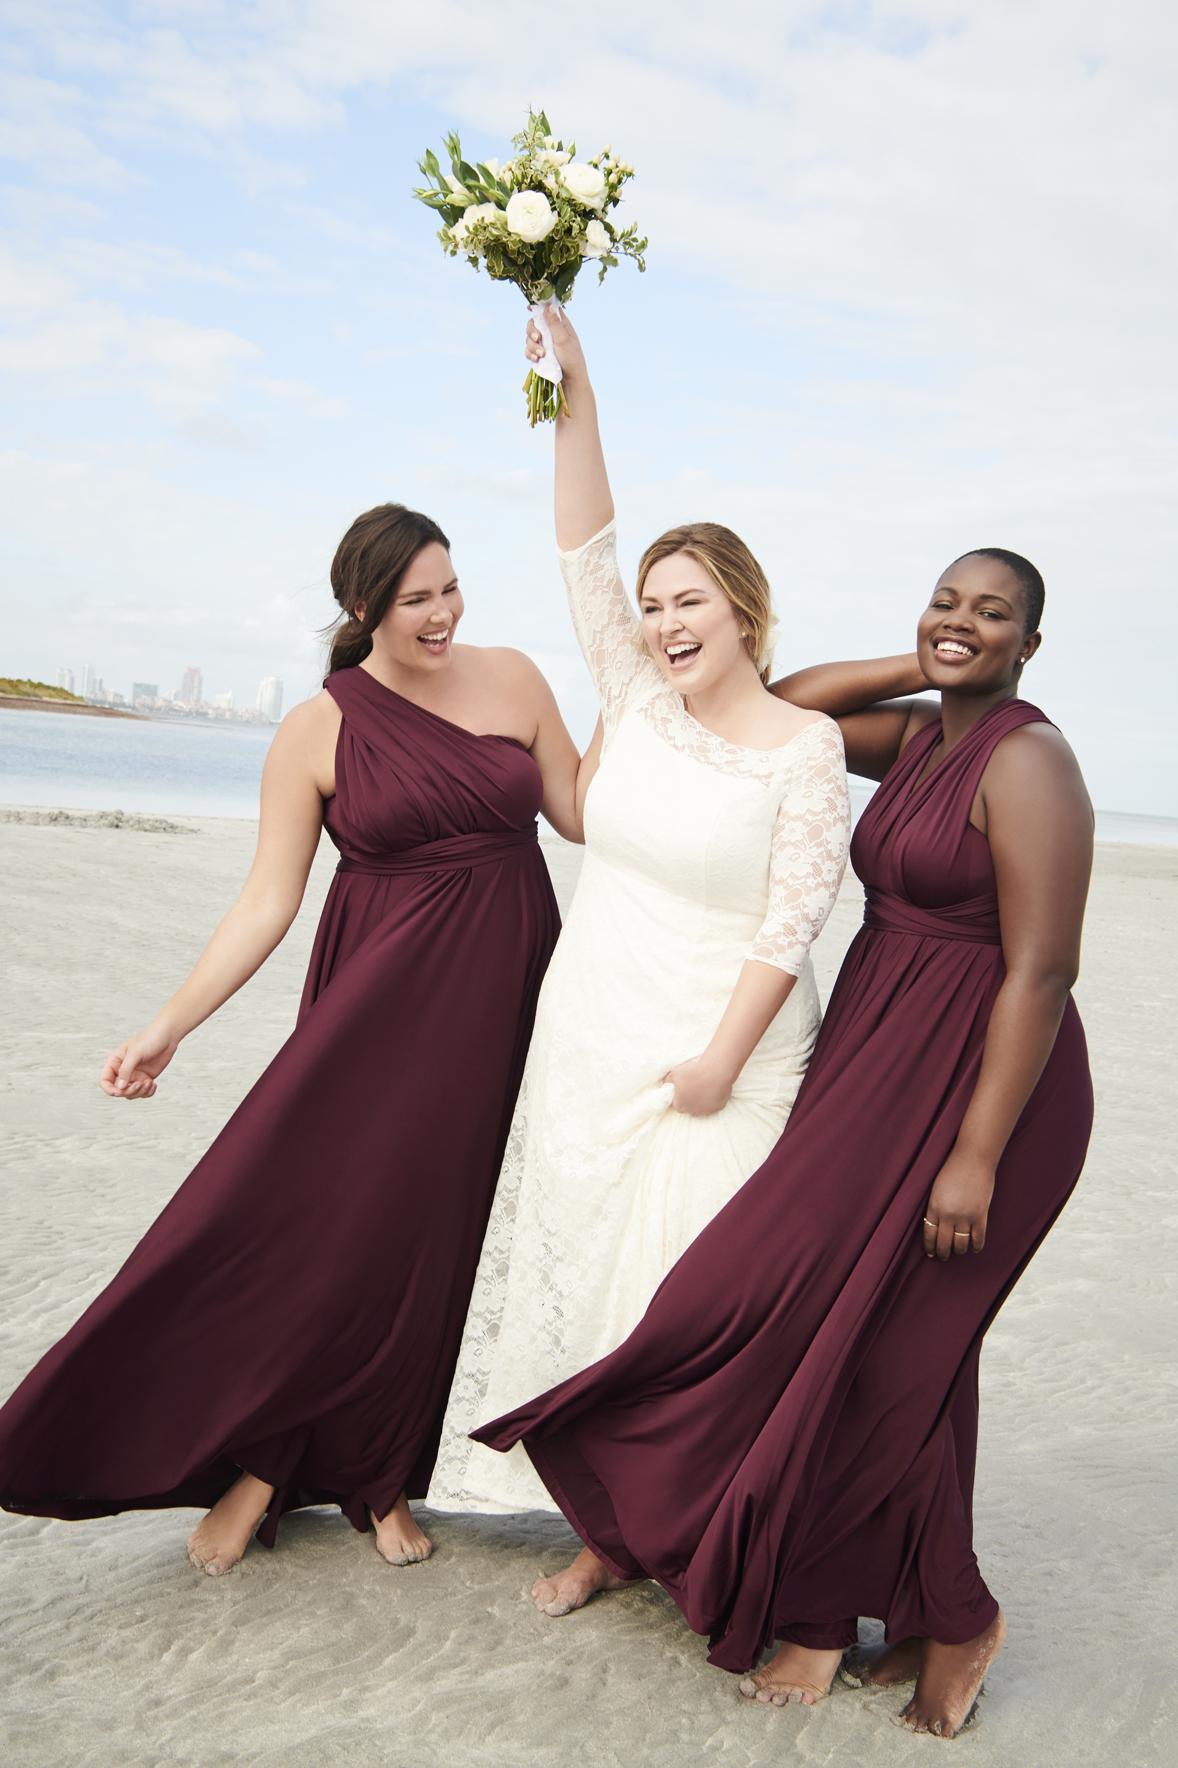 8518e91ed1a Torrid Launches New Wedding Shop For Plus Size Brides | Stylish Curves